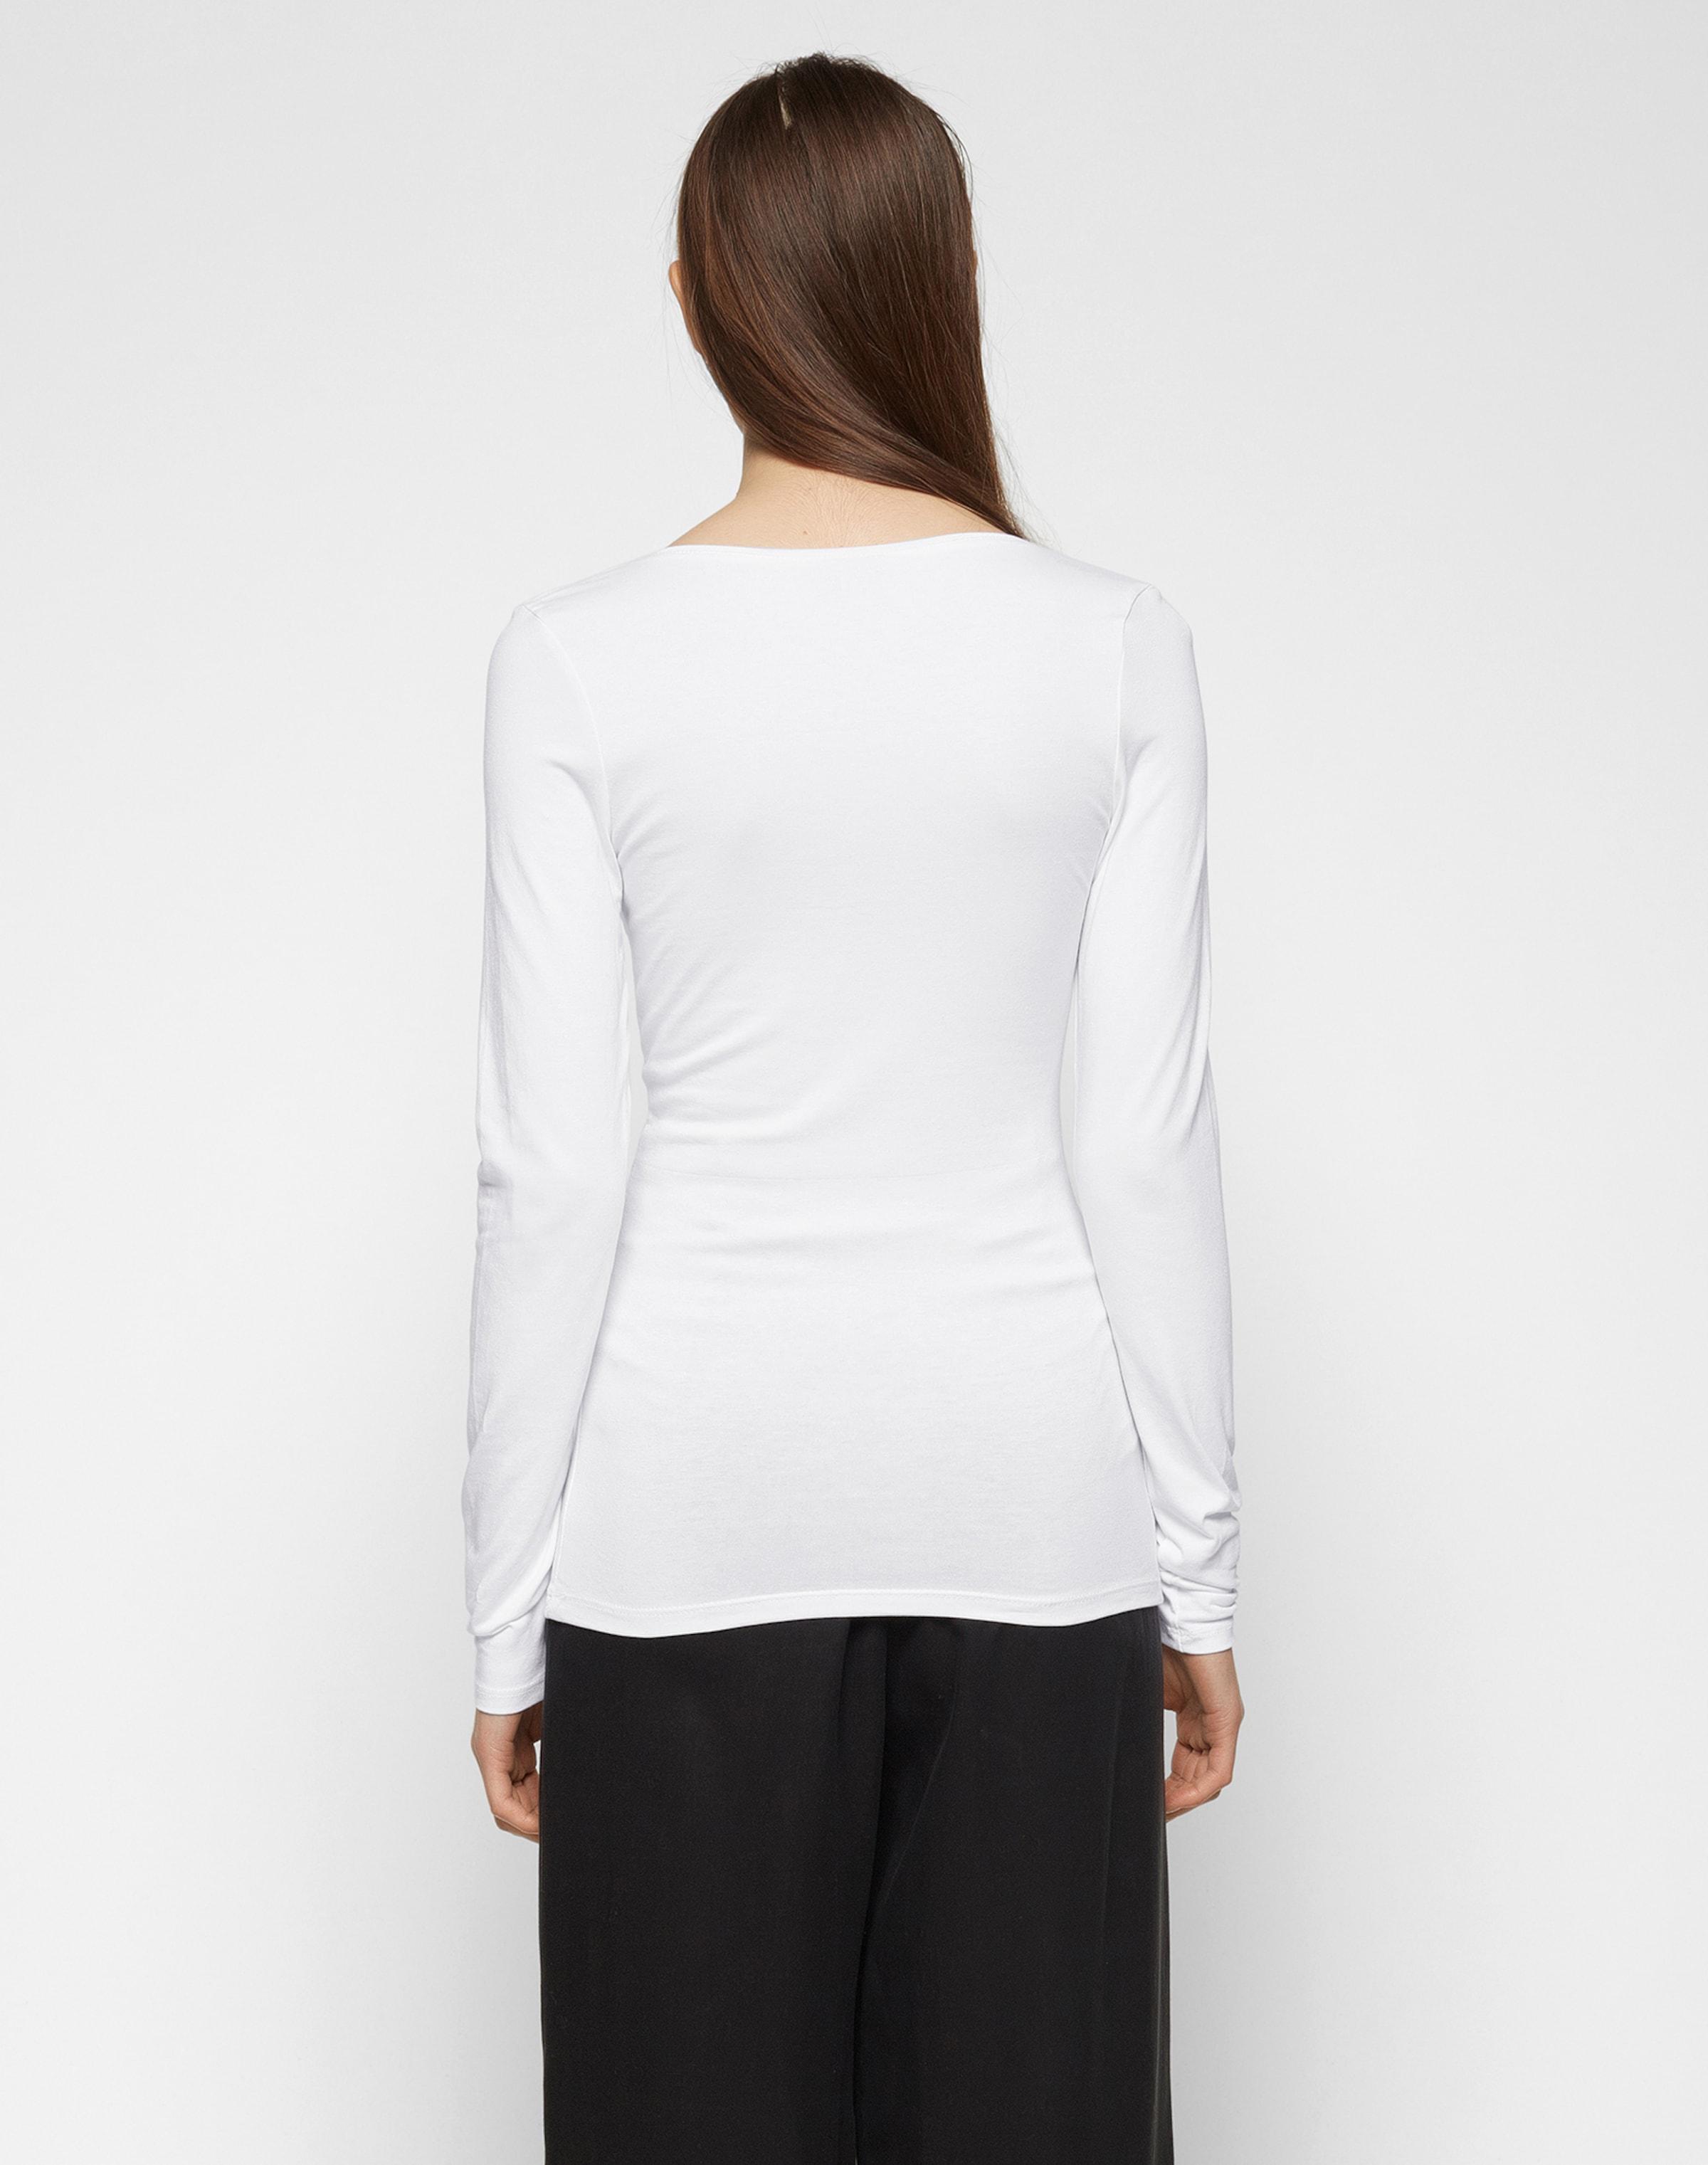 Vila shirt En 'viofficiel' T Blanc T1F3ulJcK